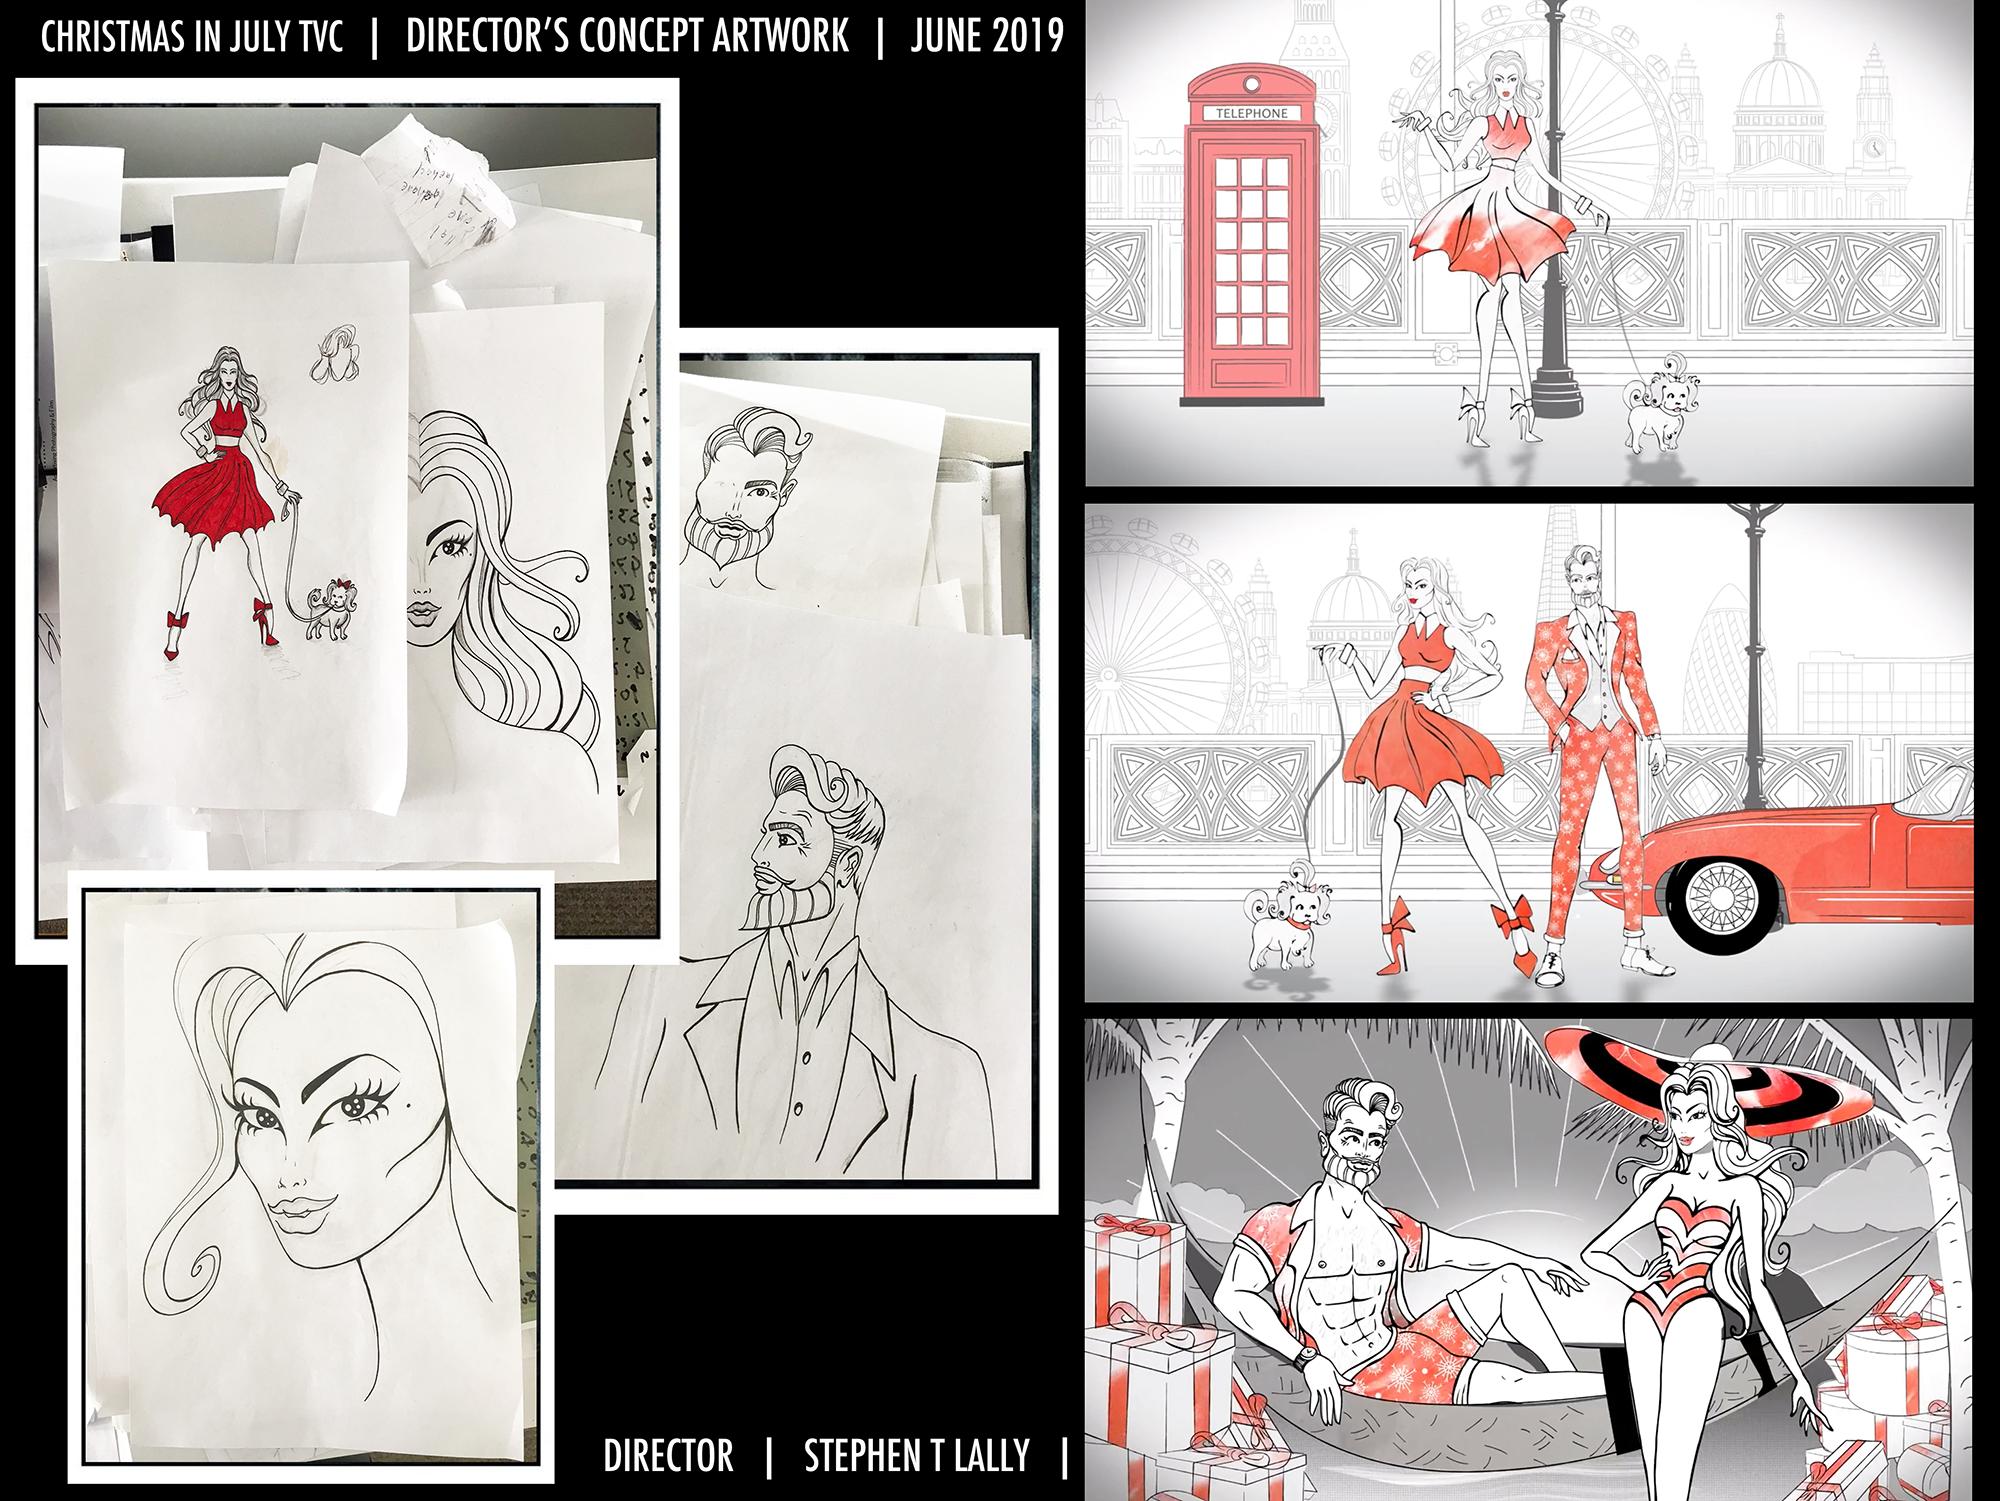 stephen_lally_storyboard_artwork_07.png